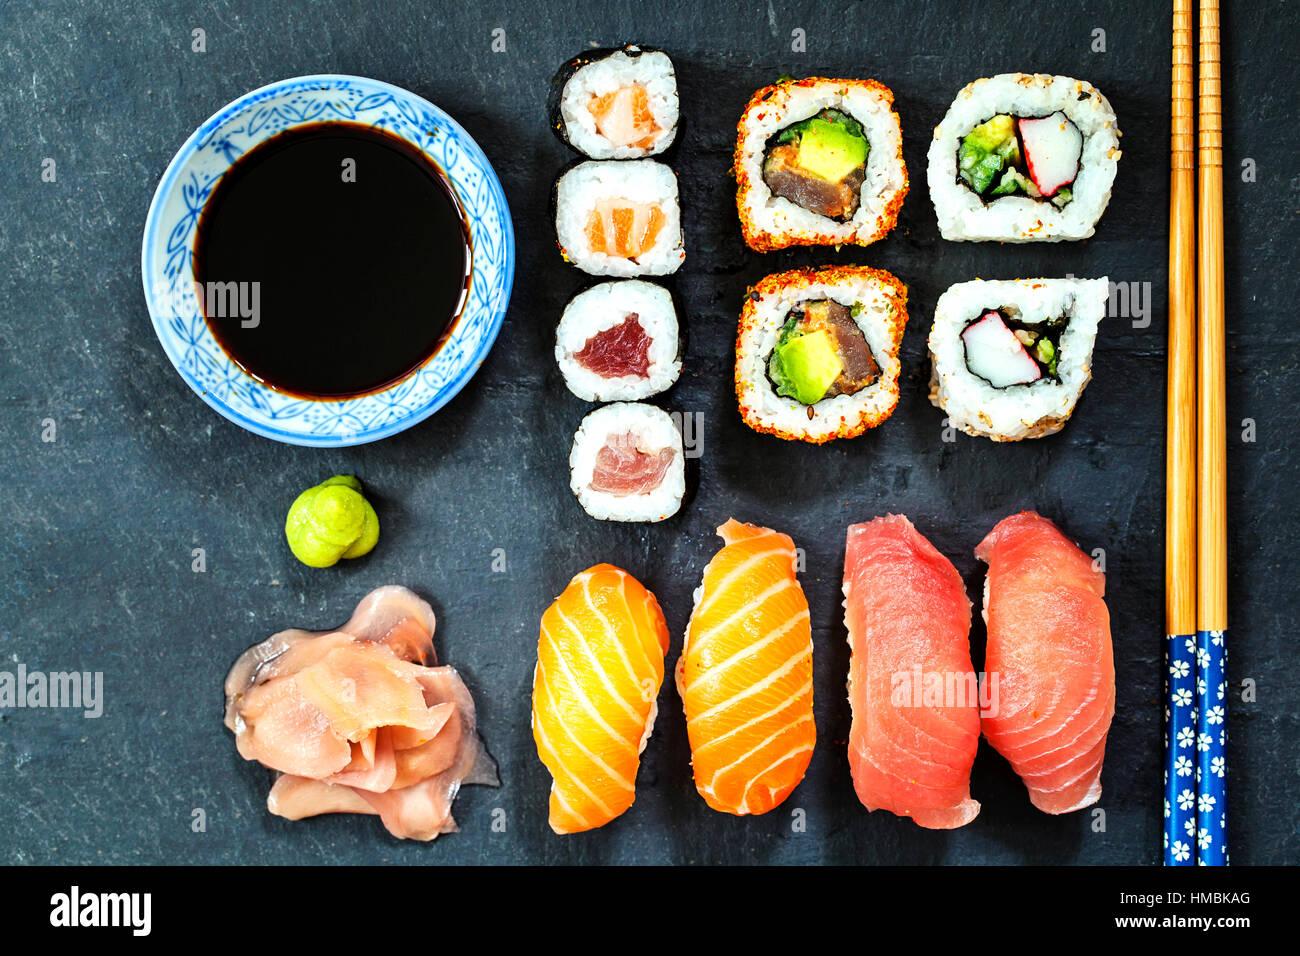 Salmon and tuna sushi on black slate plate - Stock Image